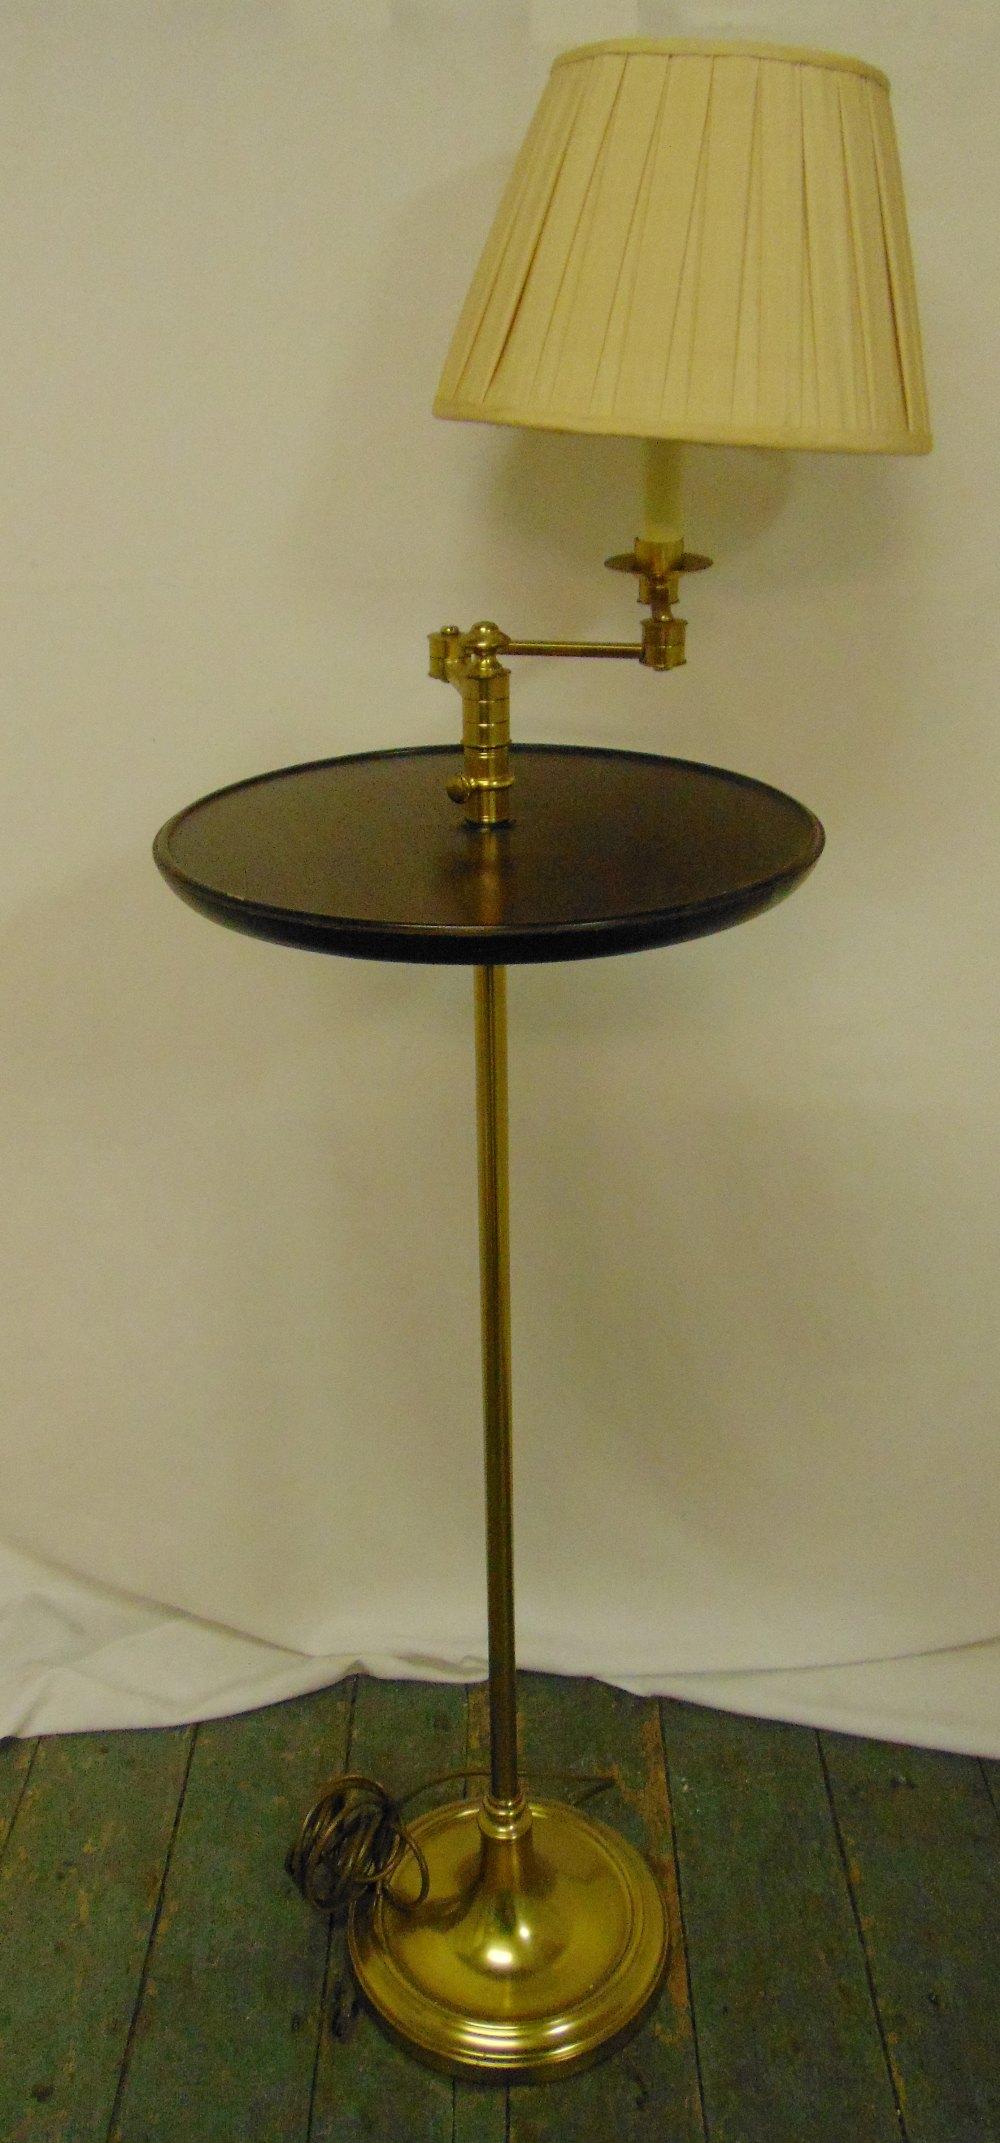 A brass and mahogany side table, circular on tubular stem with raised circular base and adjustable